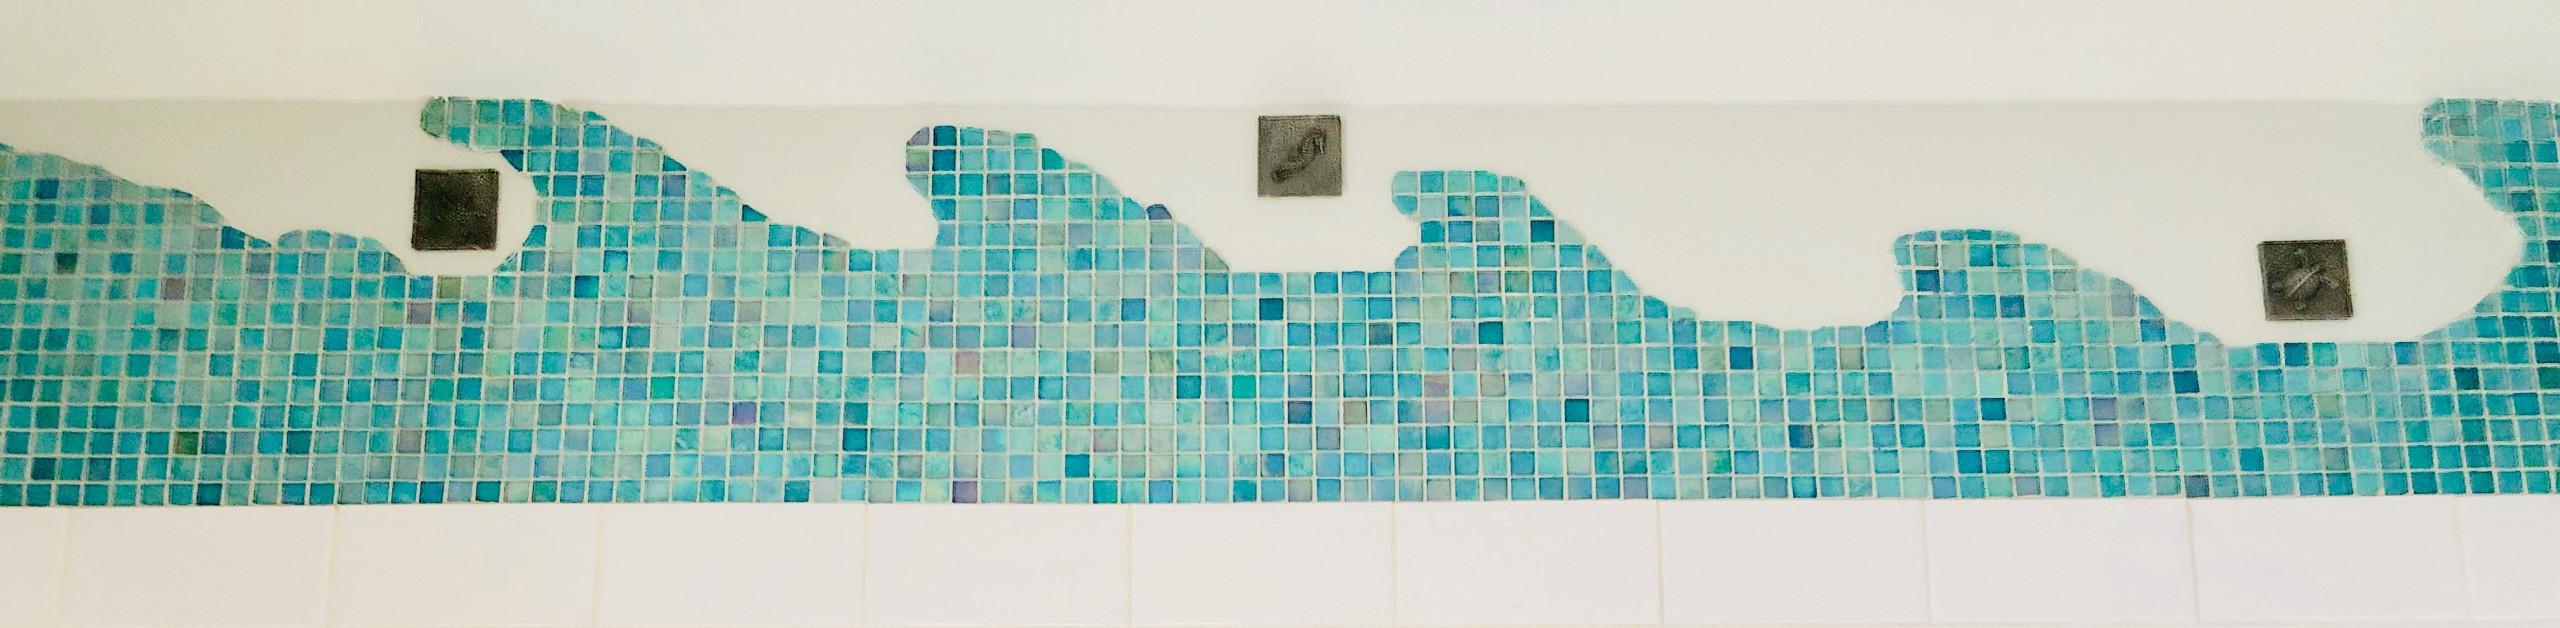 Bathroom mural detail